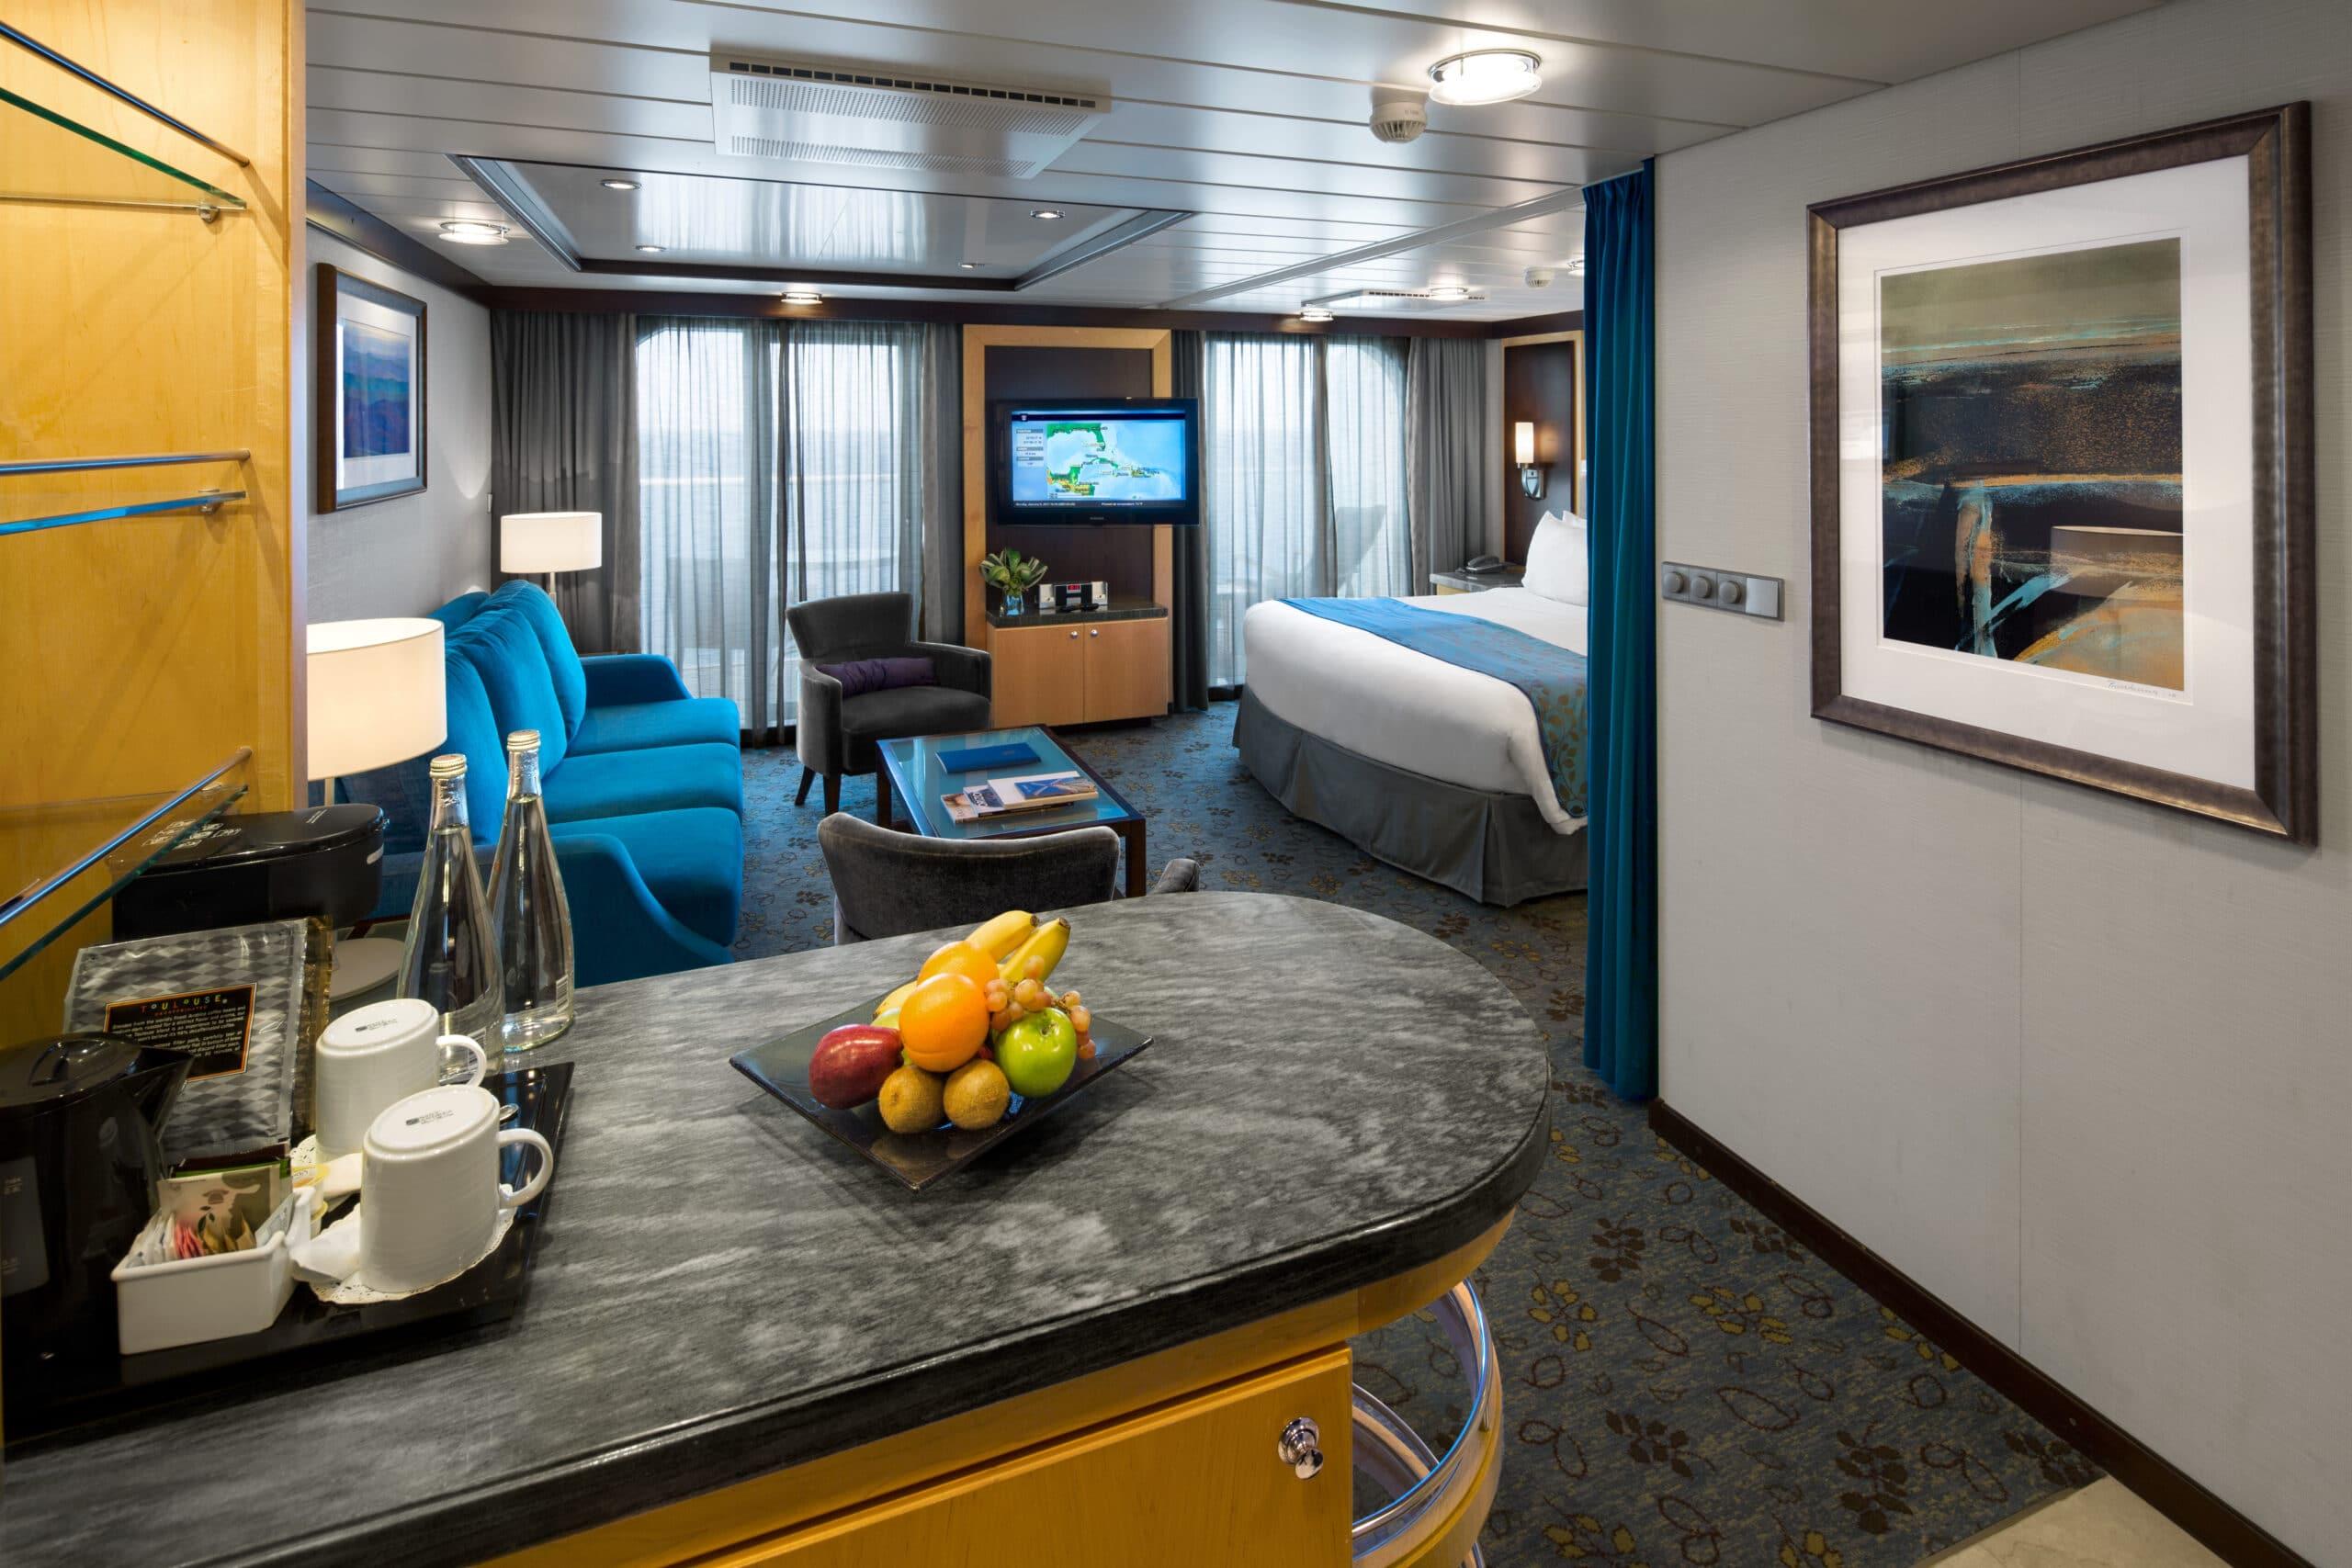 Royal-Caribbean-International-Allure-of-the-Seas-Oasis-of-the-seas-schip-cruiseschip-categorie-GS-Grand-Suite